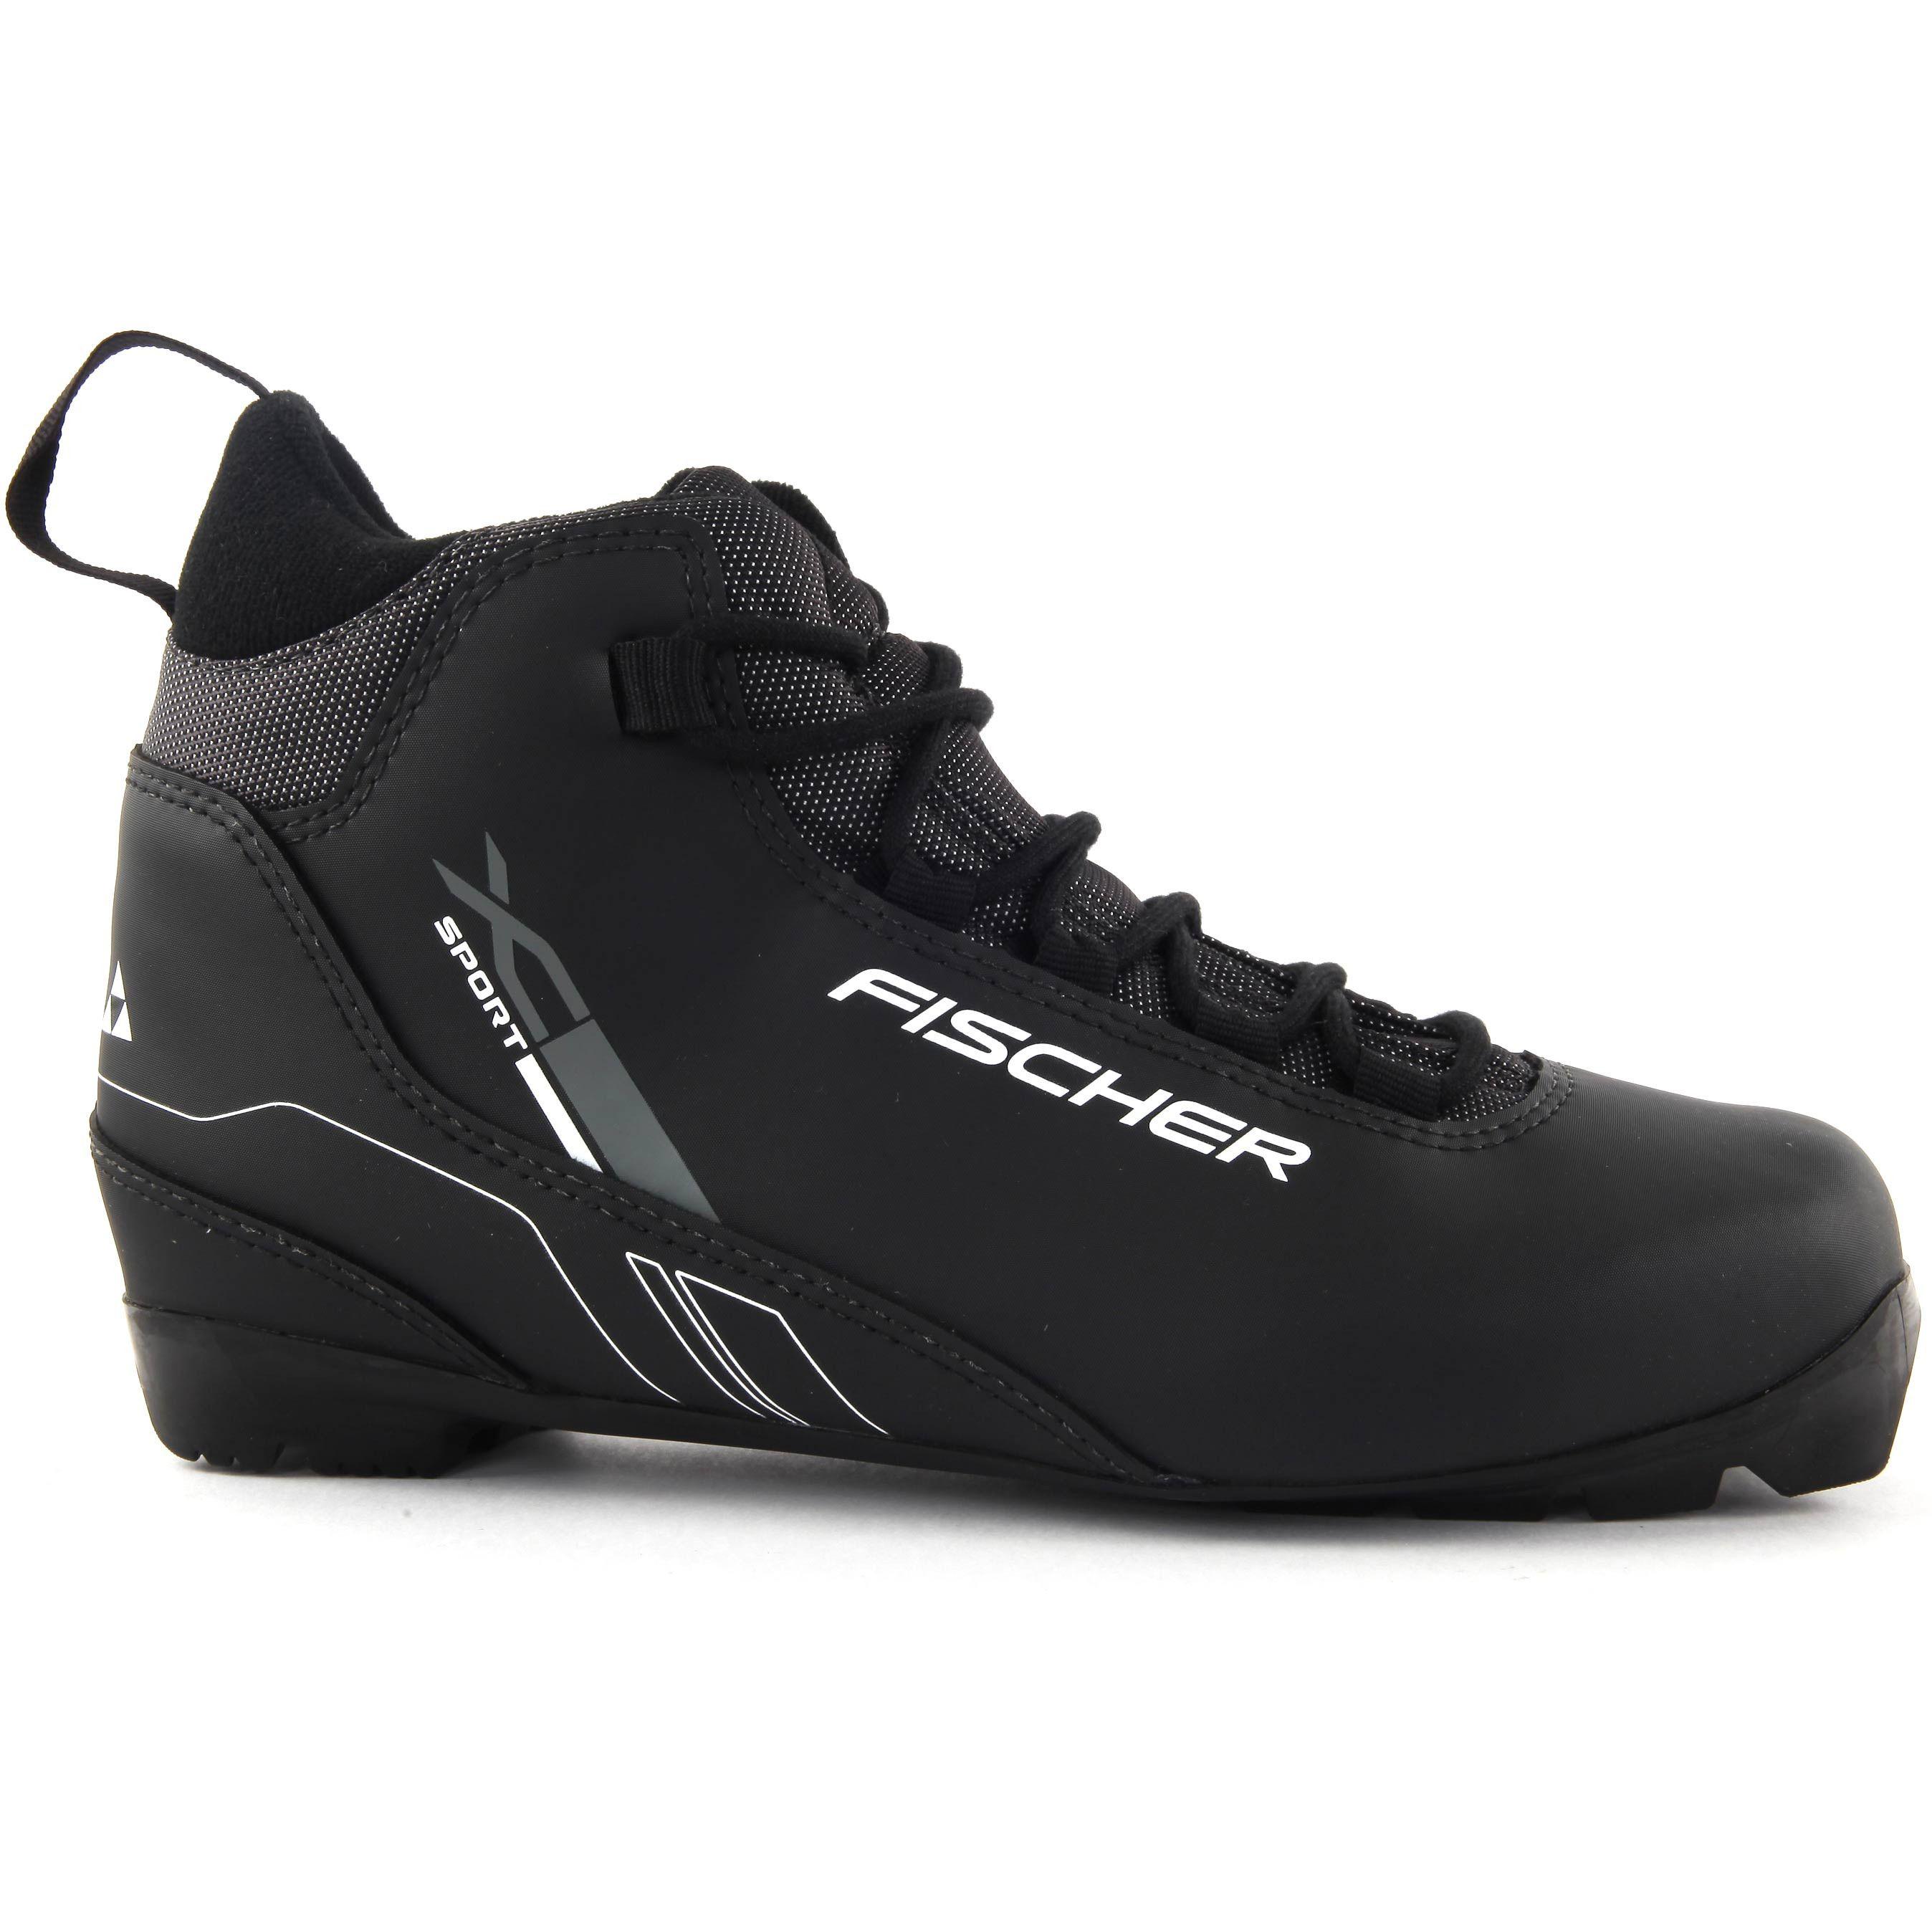 Лыжные ботинки Fischer XC Sport black р.44